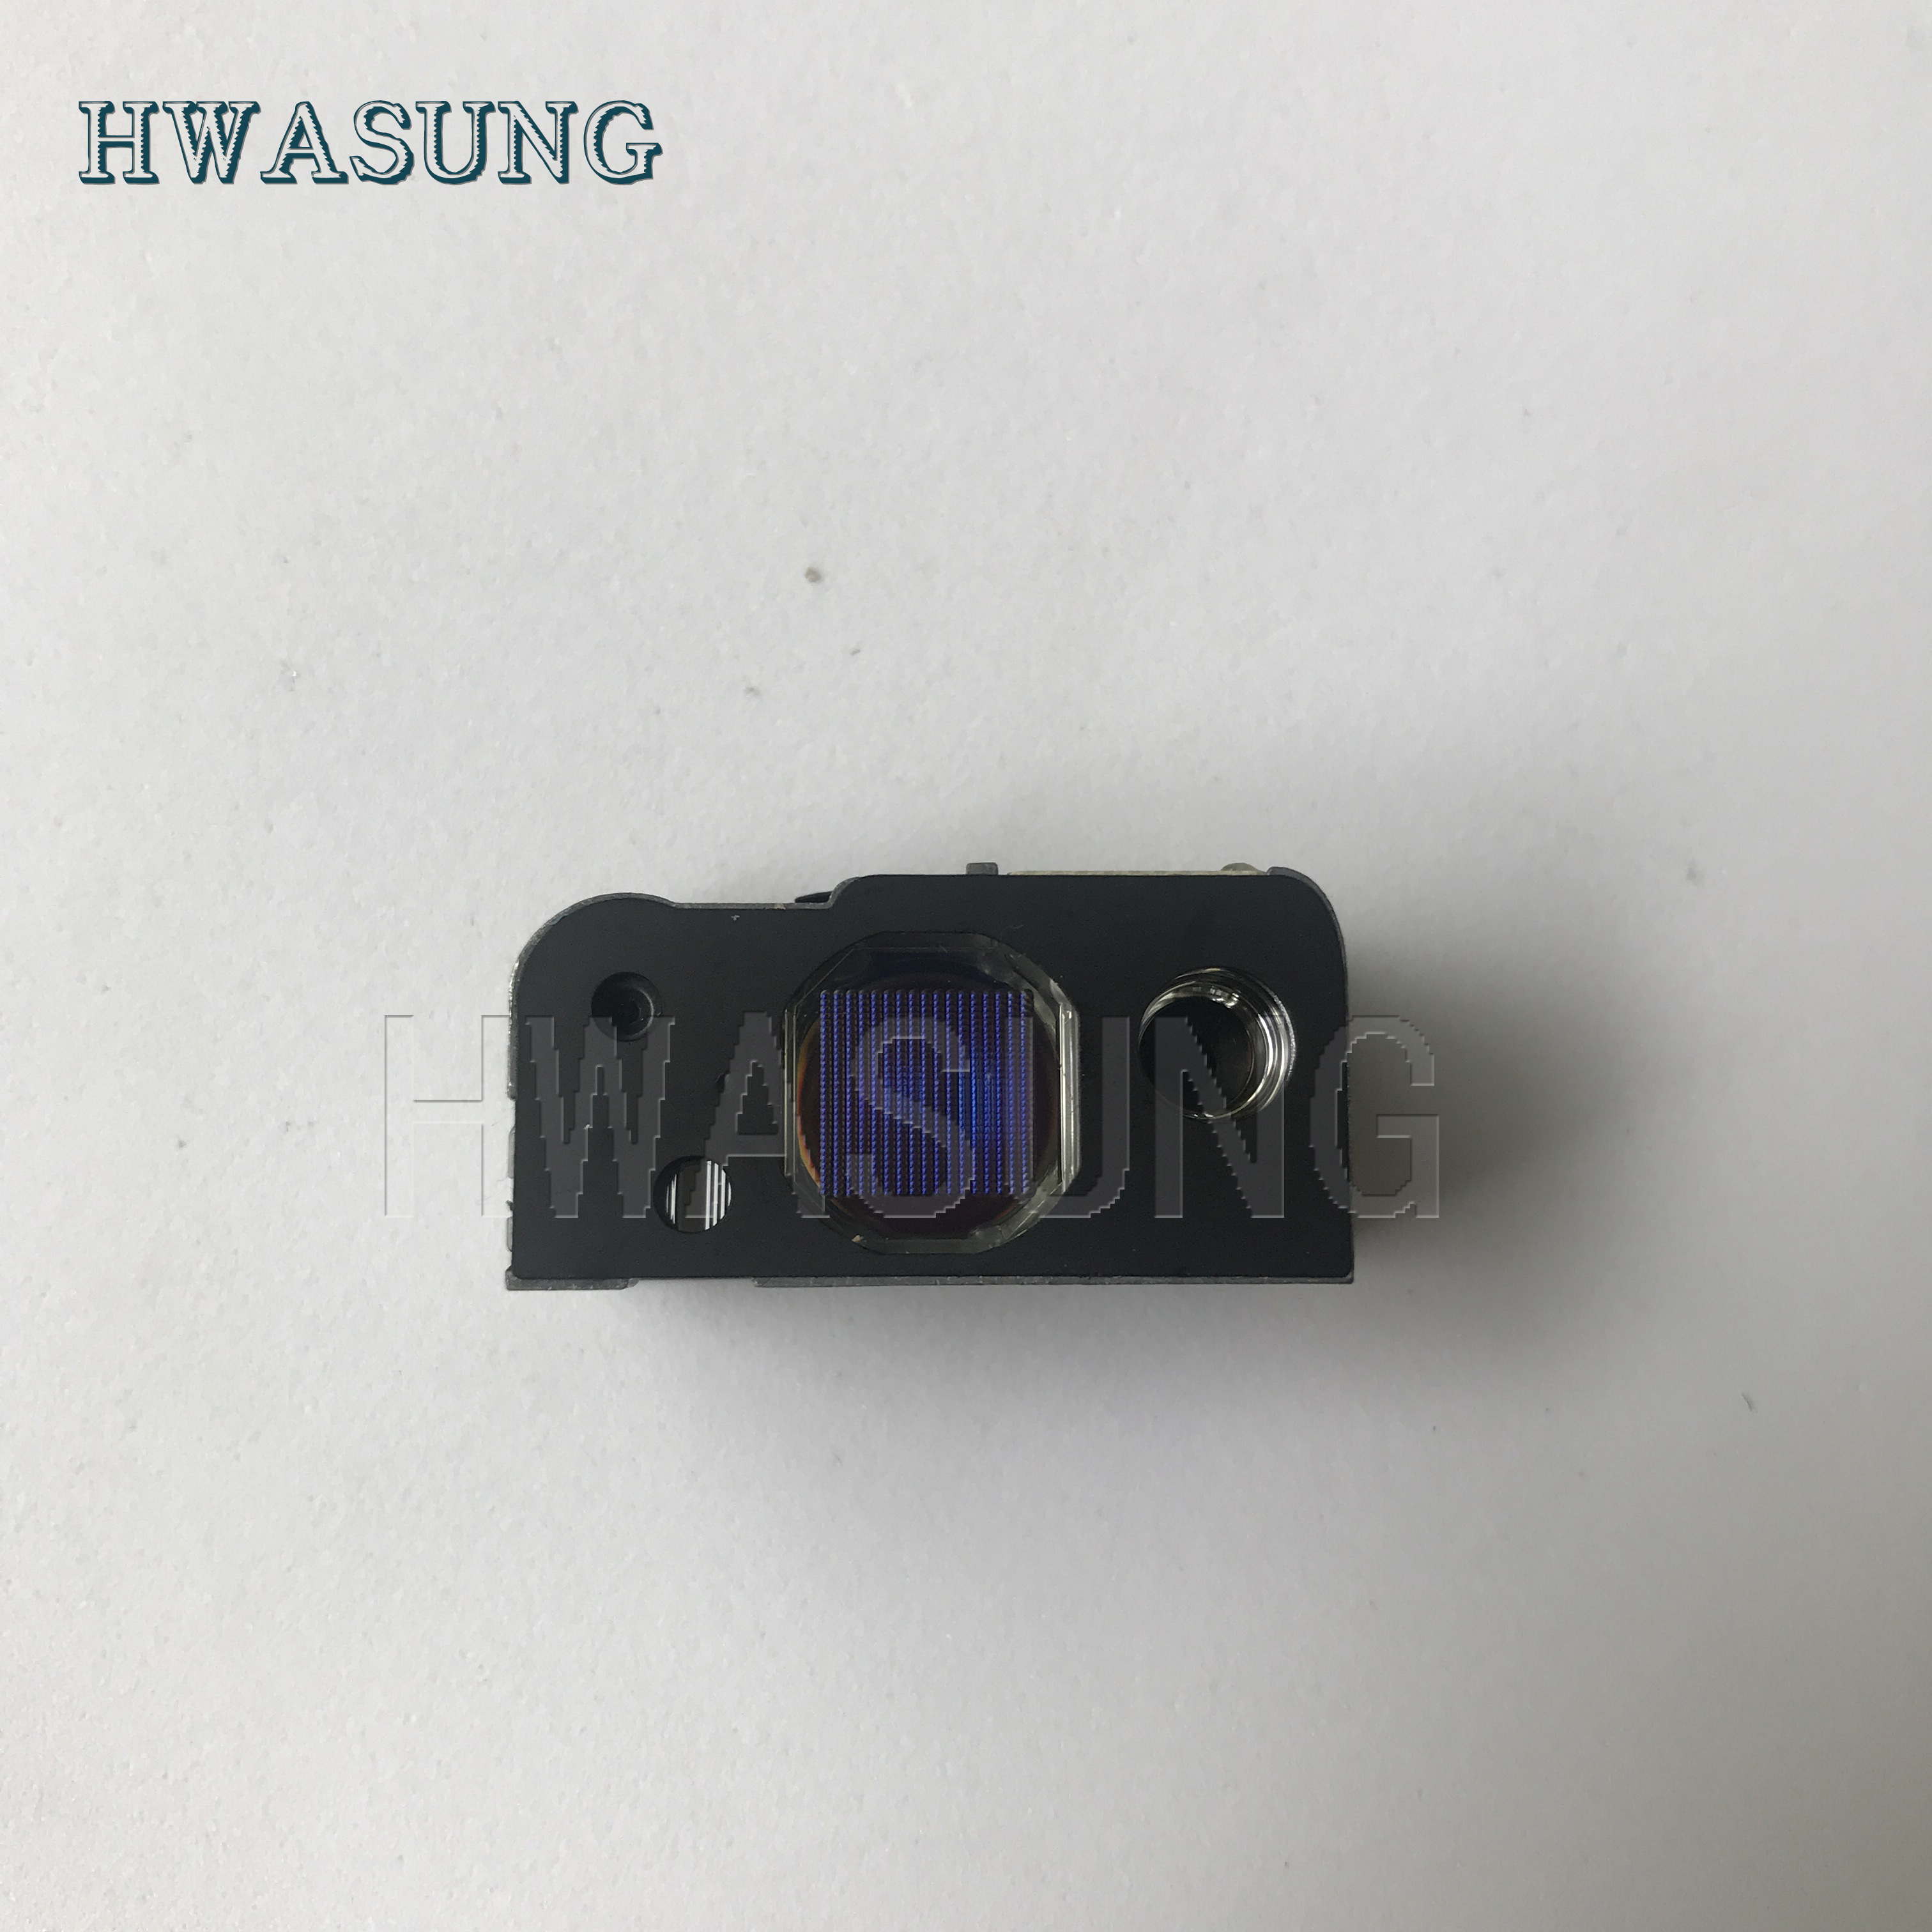 Z3E Symbol LS2208 Handheld Laser Barcode POS Scanner USB Cable